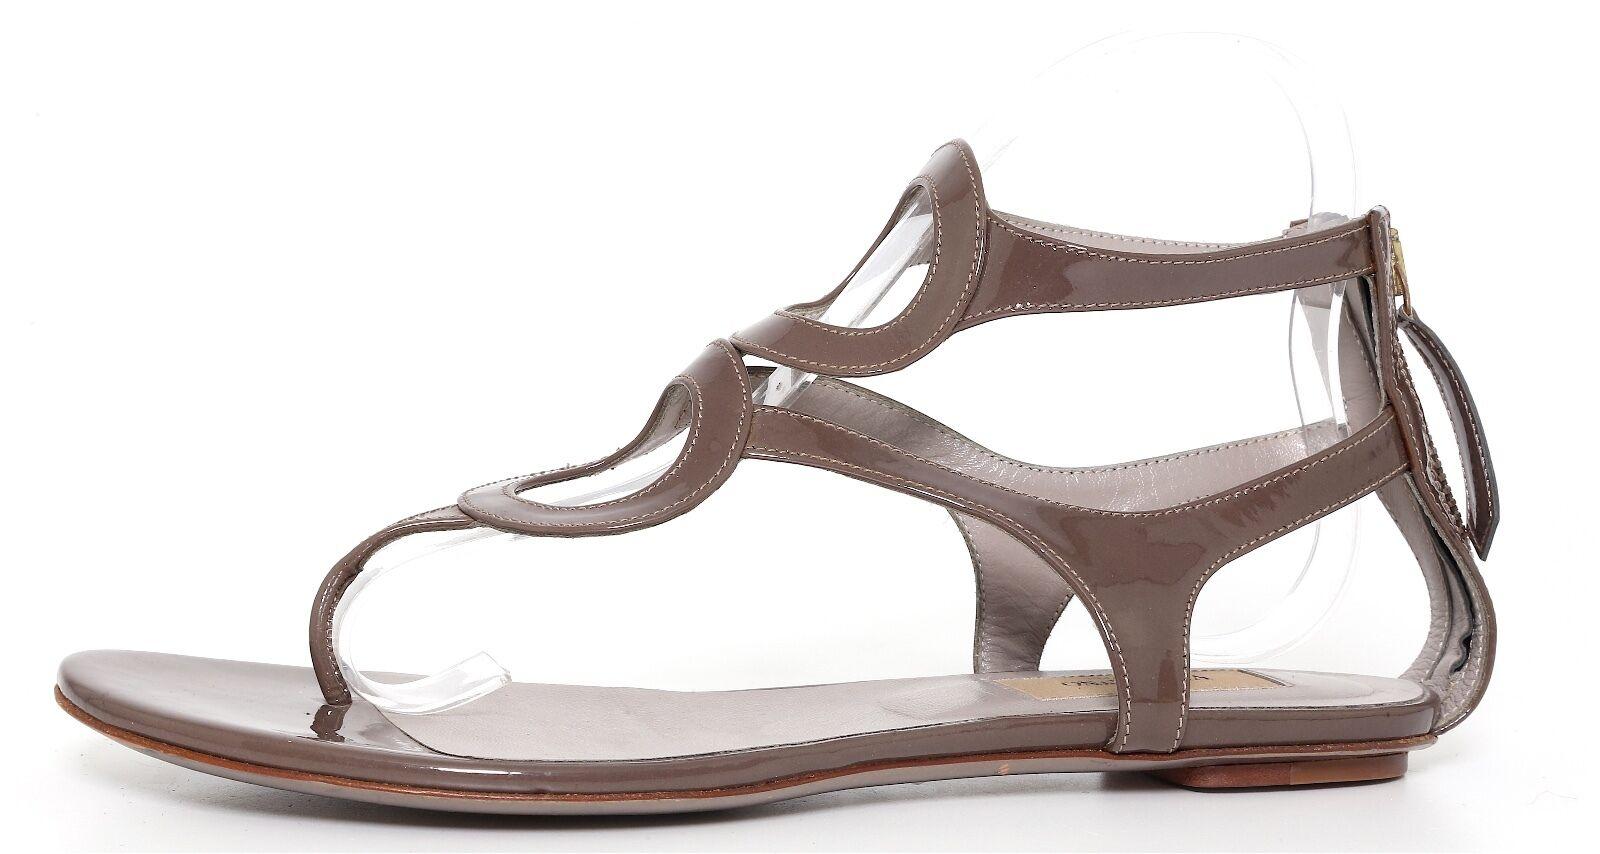 Valentino Valentino Valentino Garavani Women's Patent Leather Grey Brown Sandals 2222 Sz 37.5 EUR f8eaee